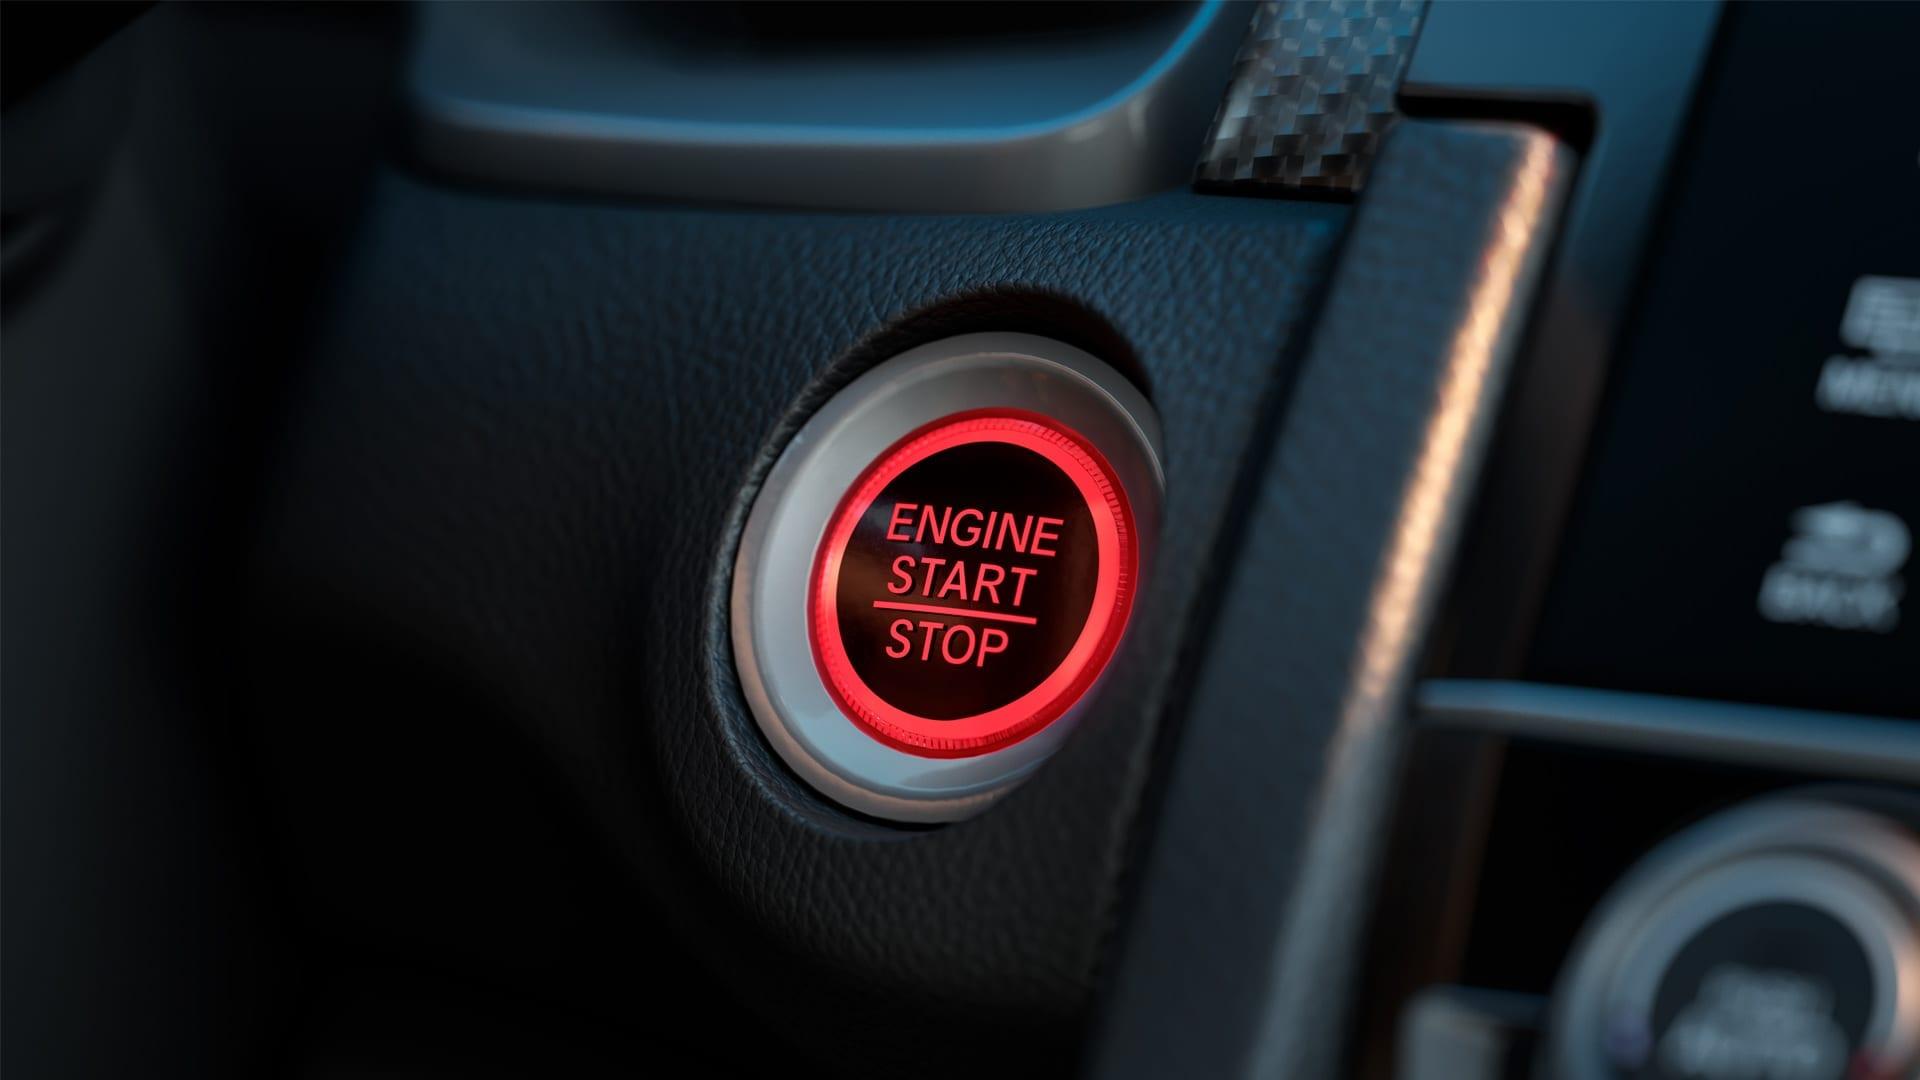 Civic SI - Botão ENGINE START/STOP (partida sem chave)